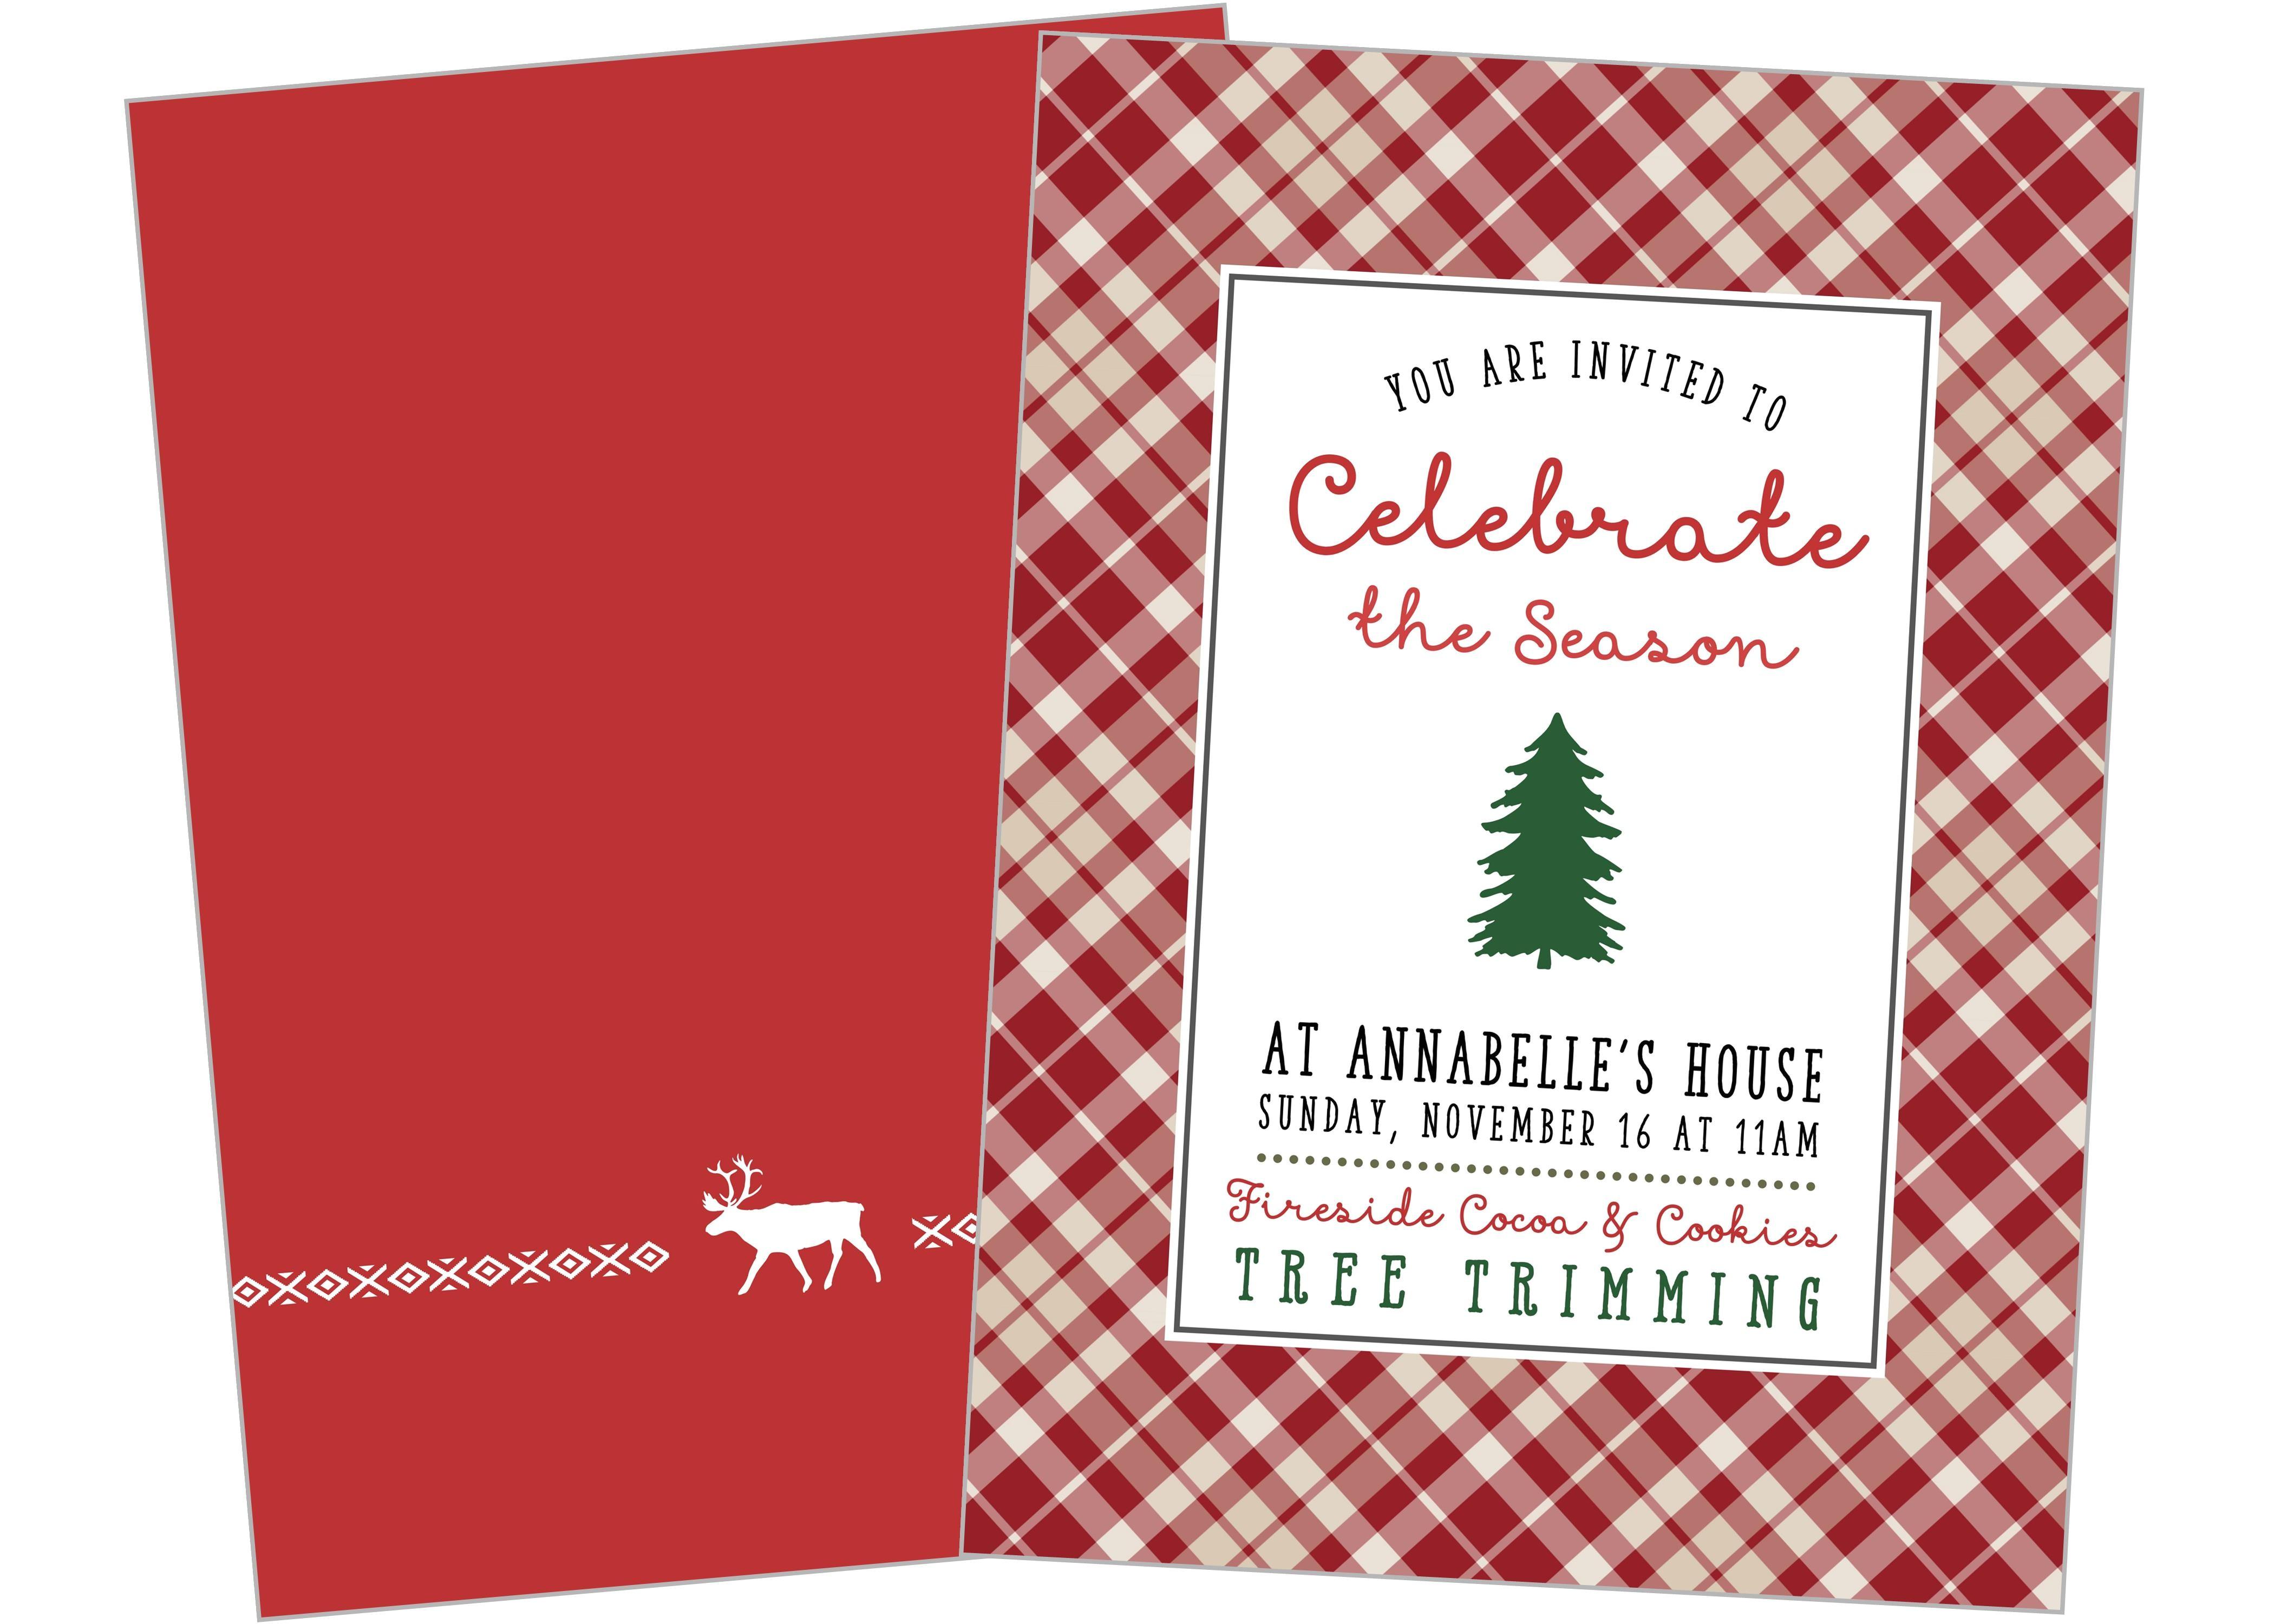 tree trimming party printable invitation christmas winter season